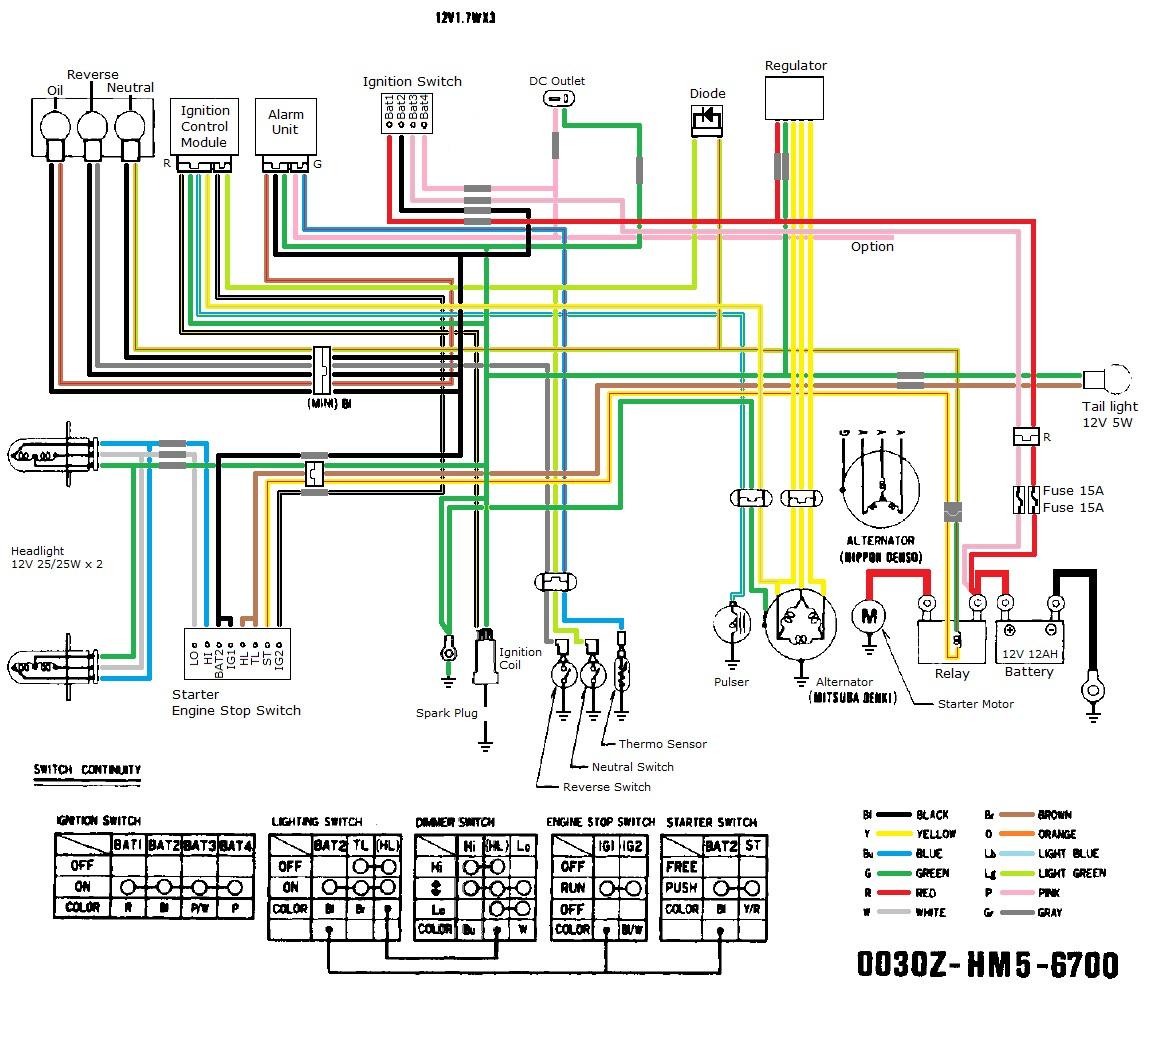 110Cc Atv Wiring Switch - Wiring Diagram Data Oreo - 110Cc Atv Wiring Diagram